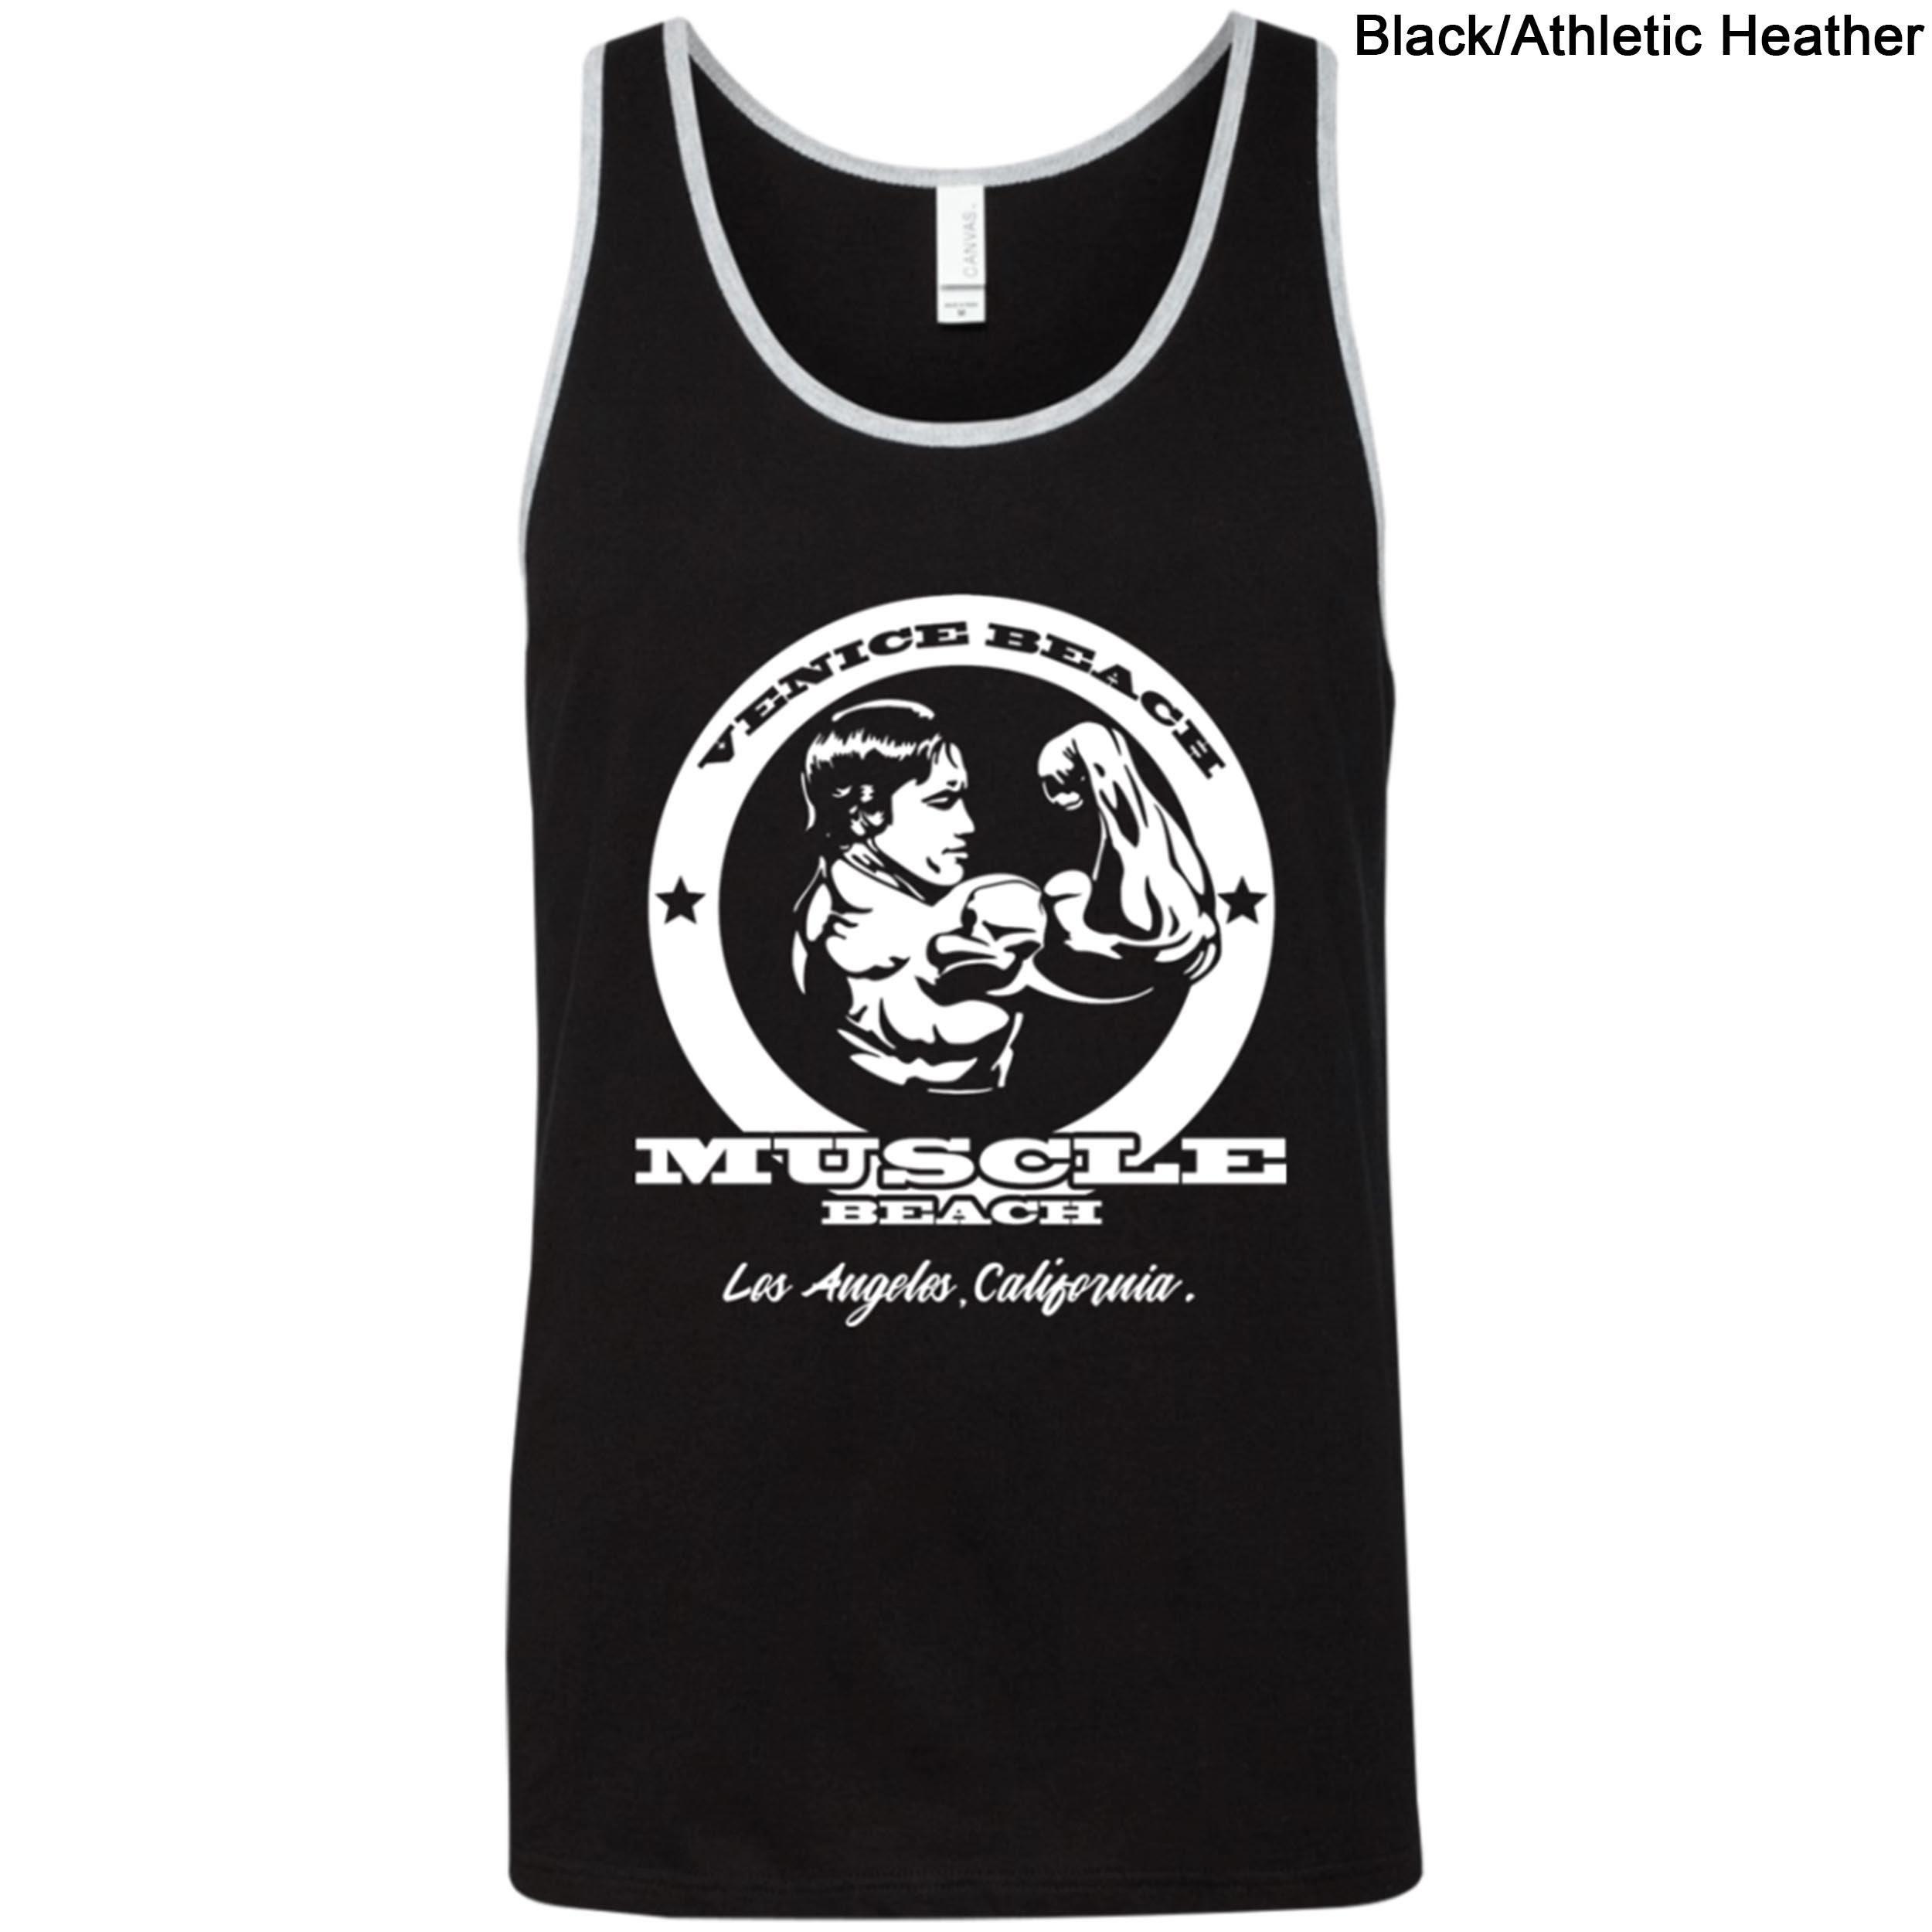 7db6d2db Arnold Schwarzenegger Shirt Venice Beach Muscle Beach Gym | Etsy